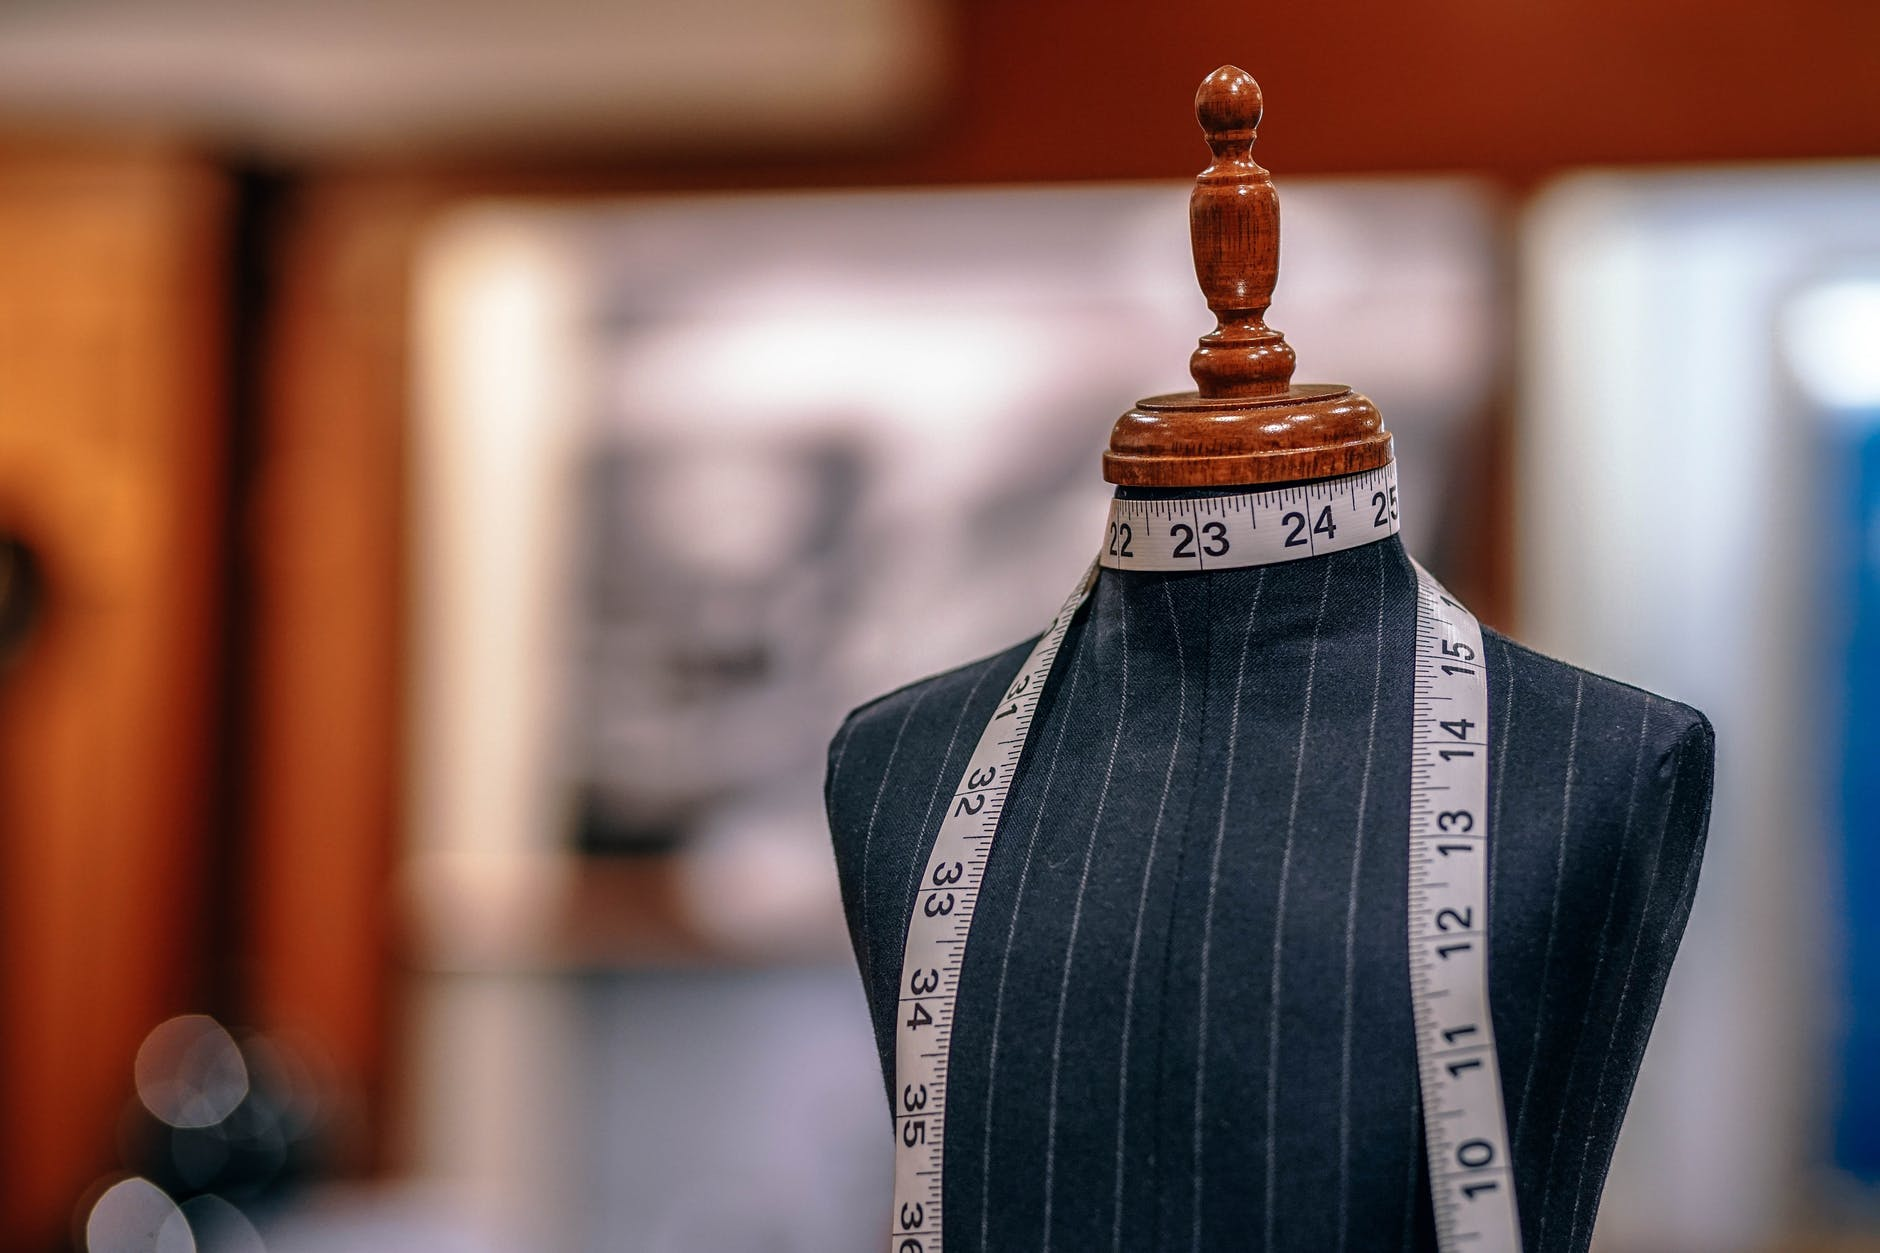 tailors dummy tape measure